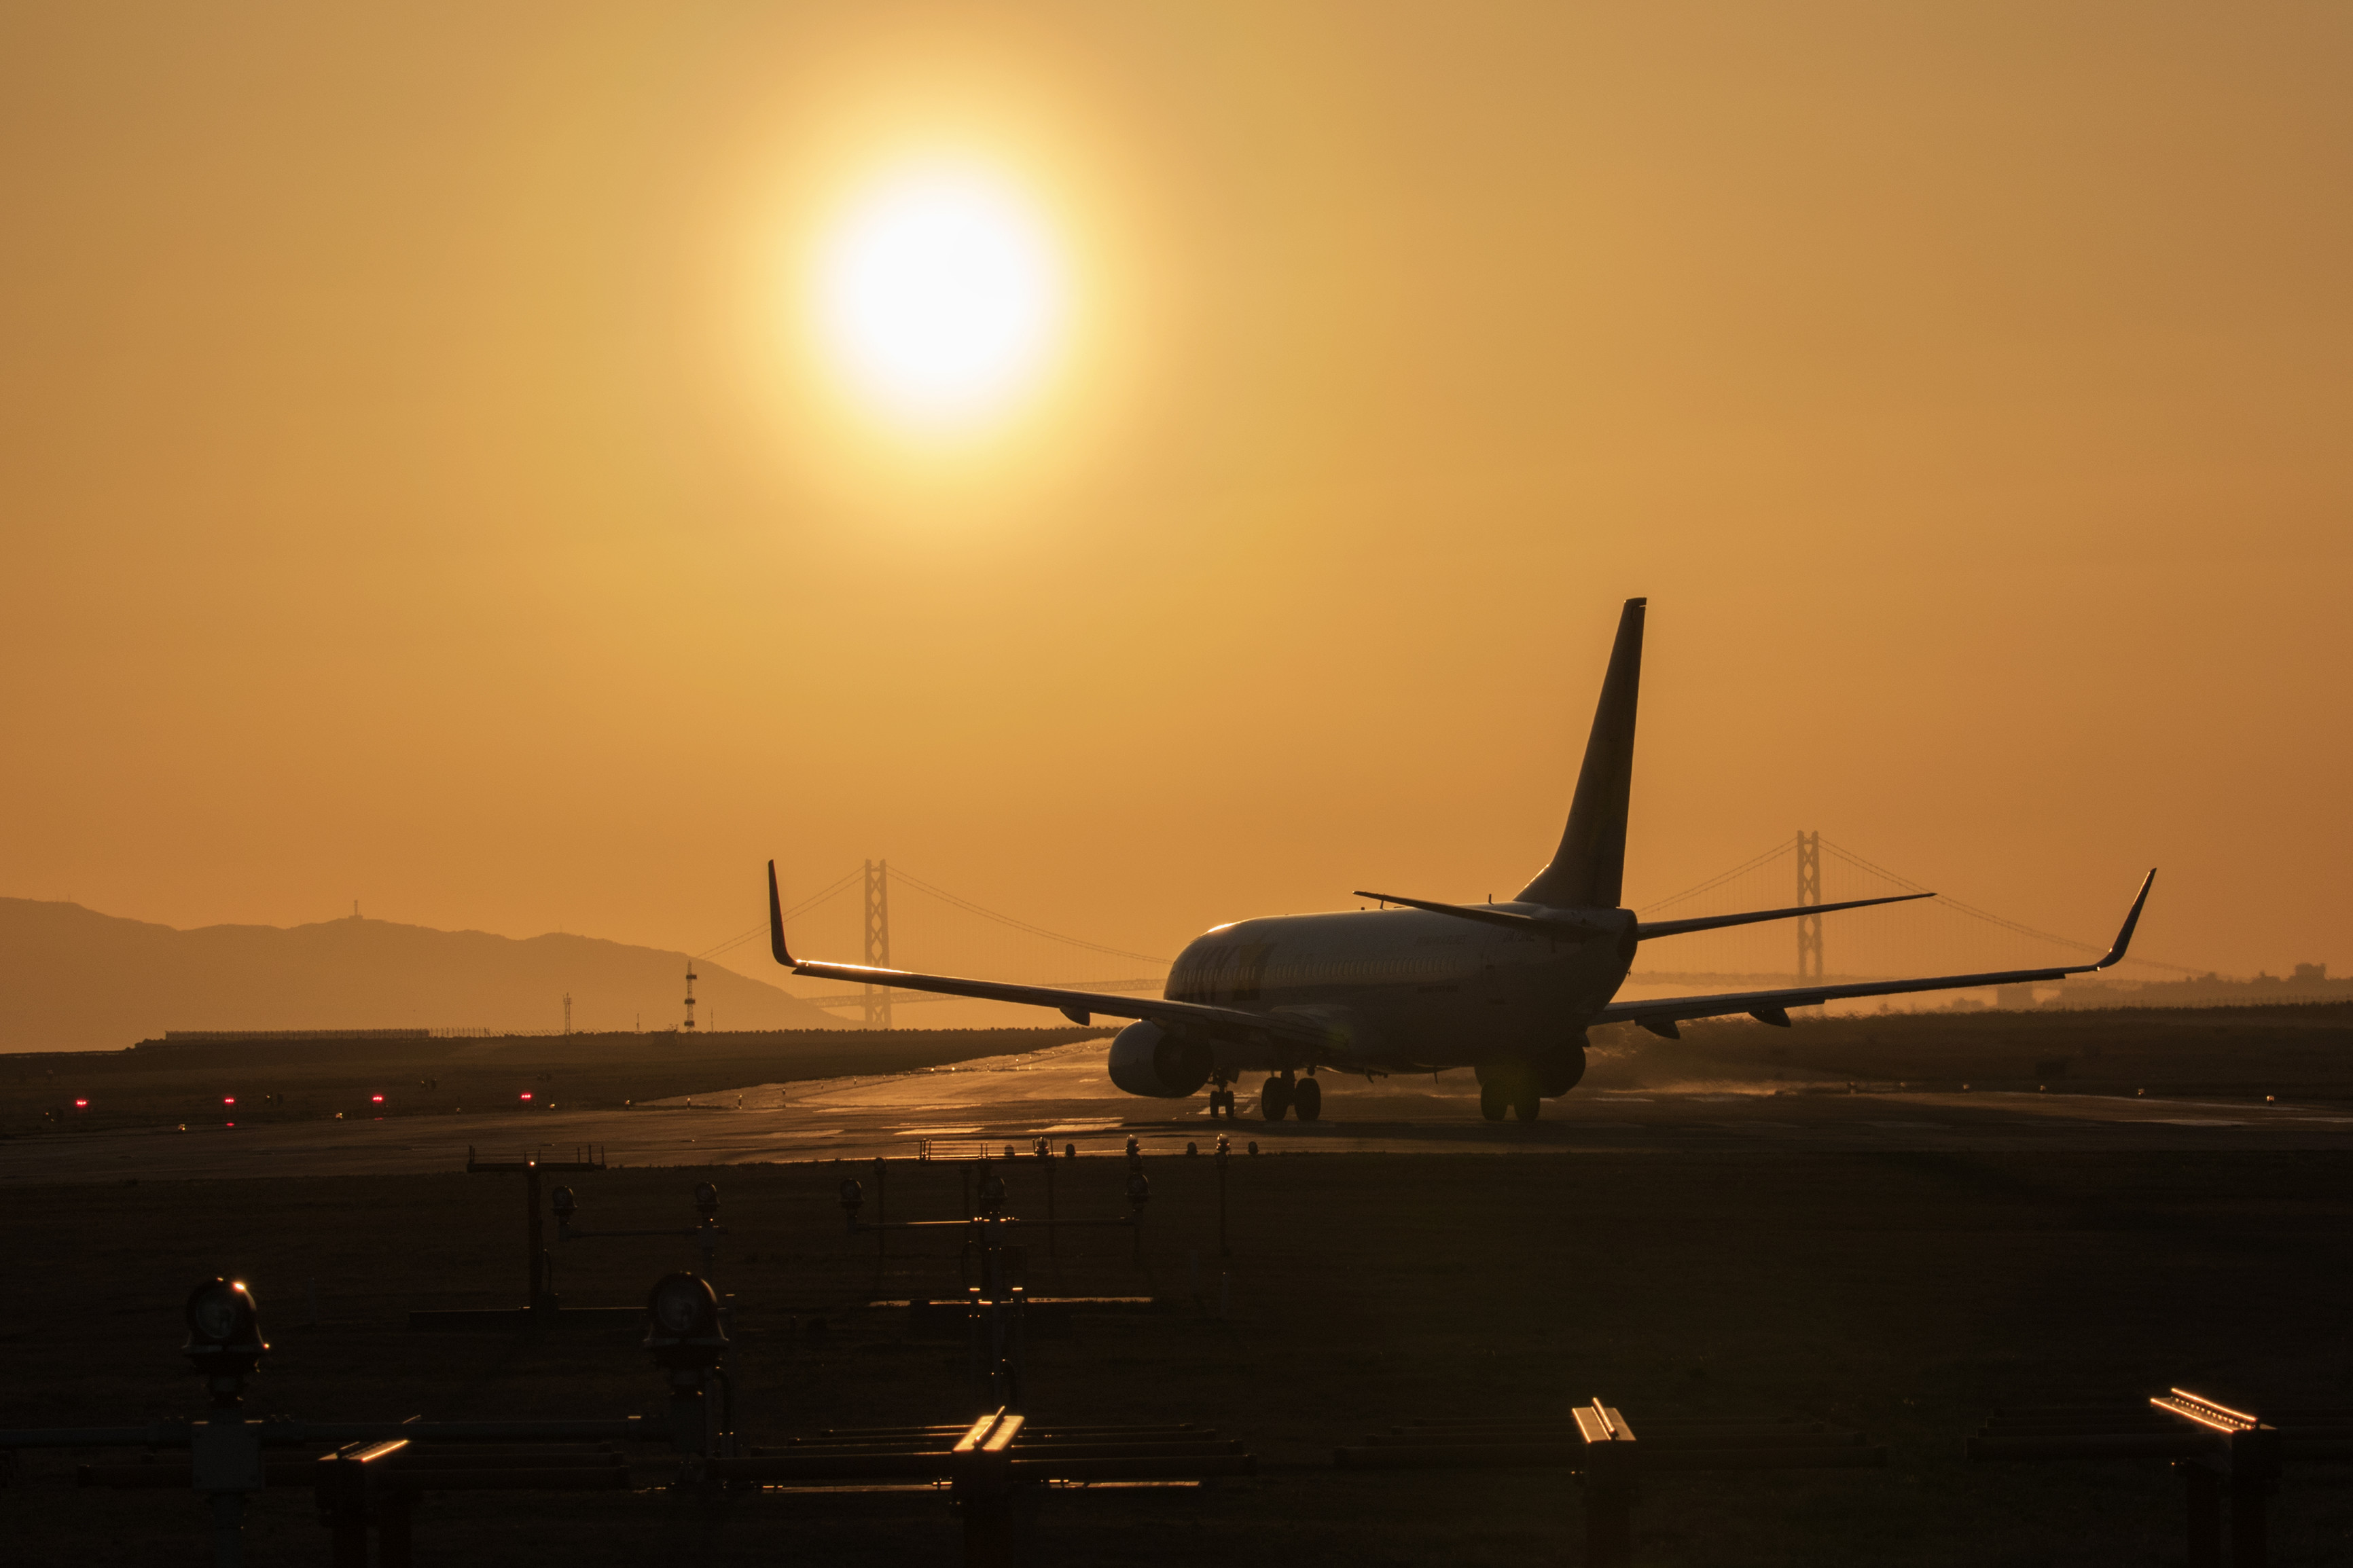 05_Sacci_旅立ちの時_神戸空港_トリミング角度調整